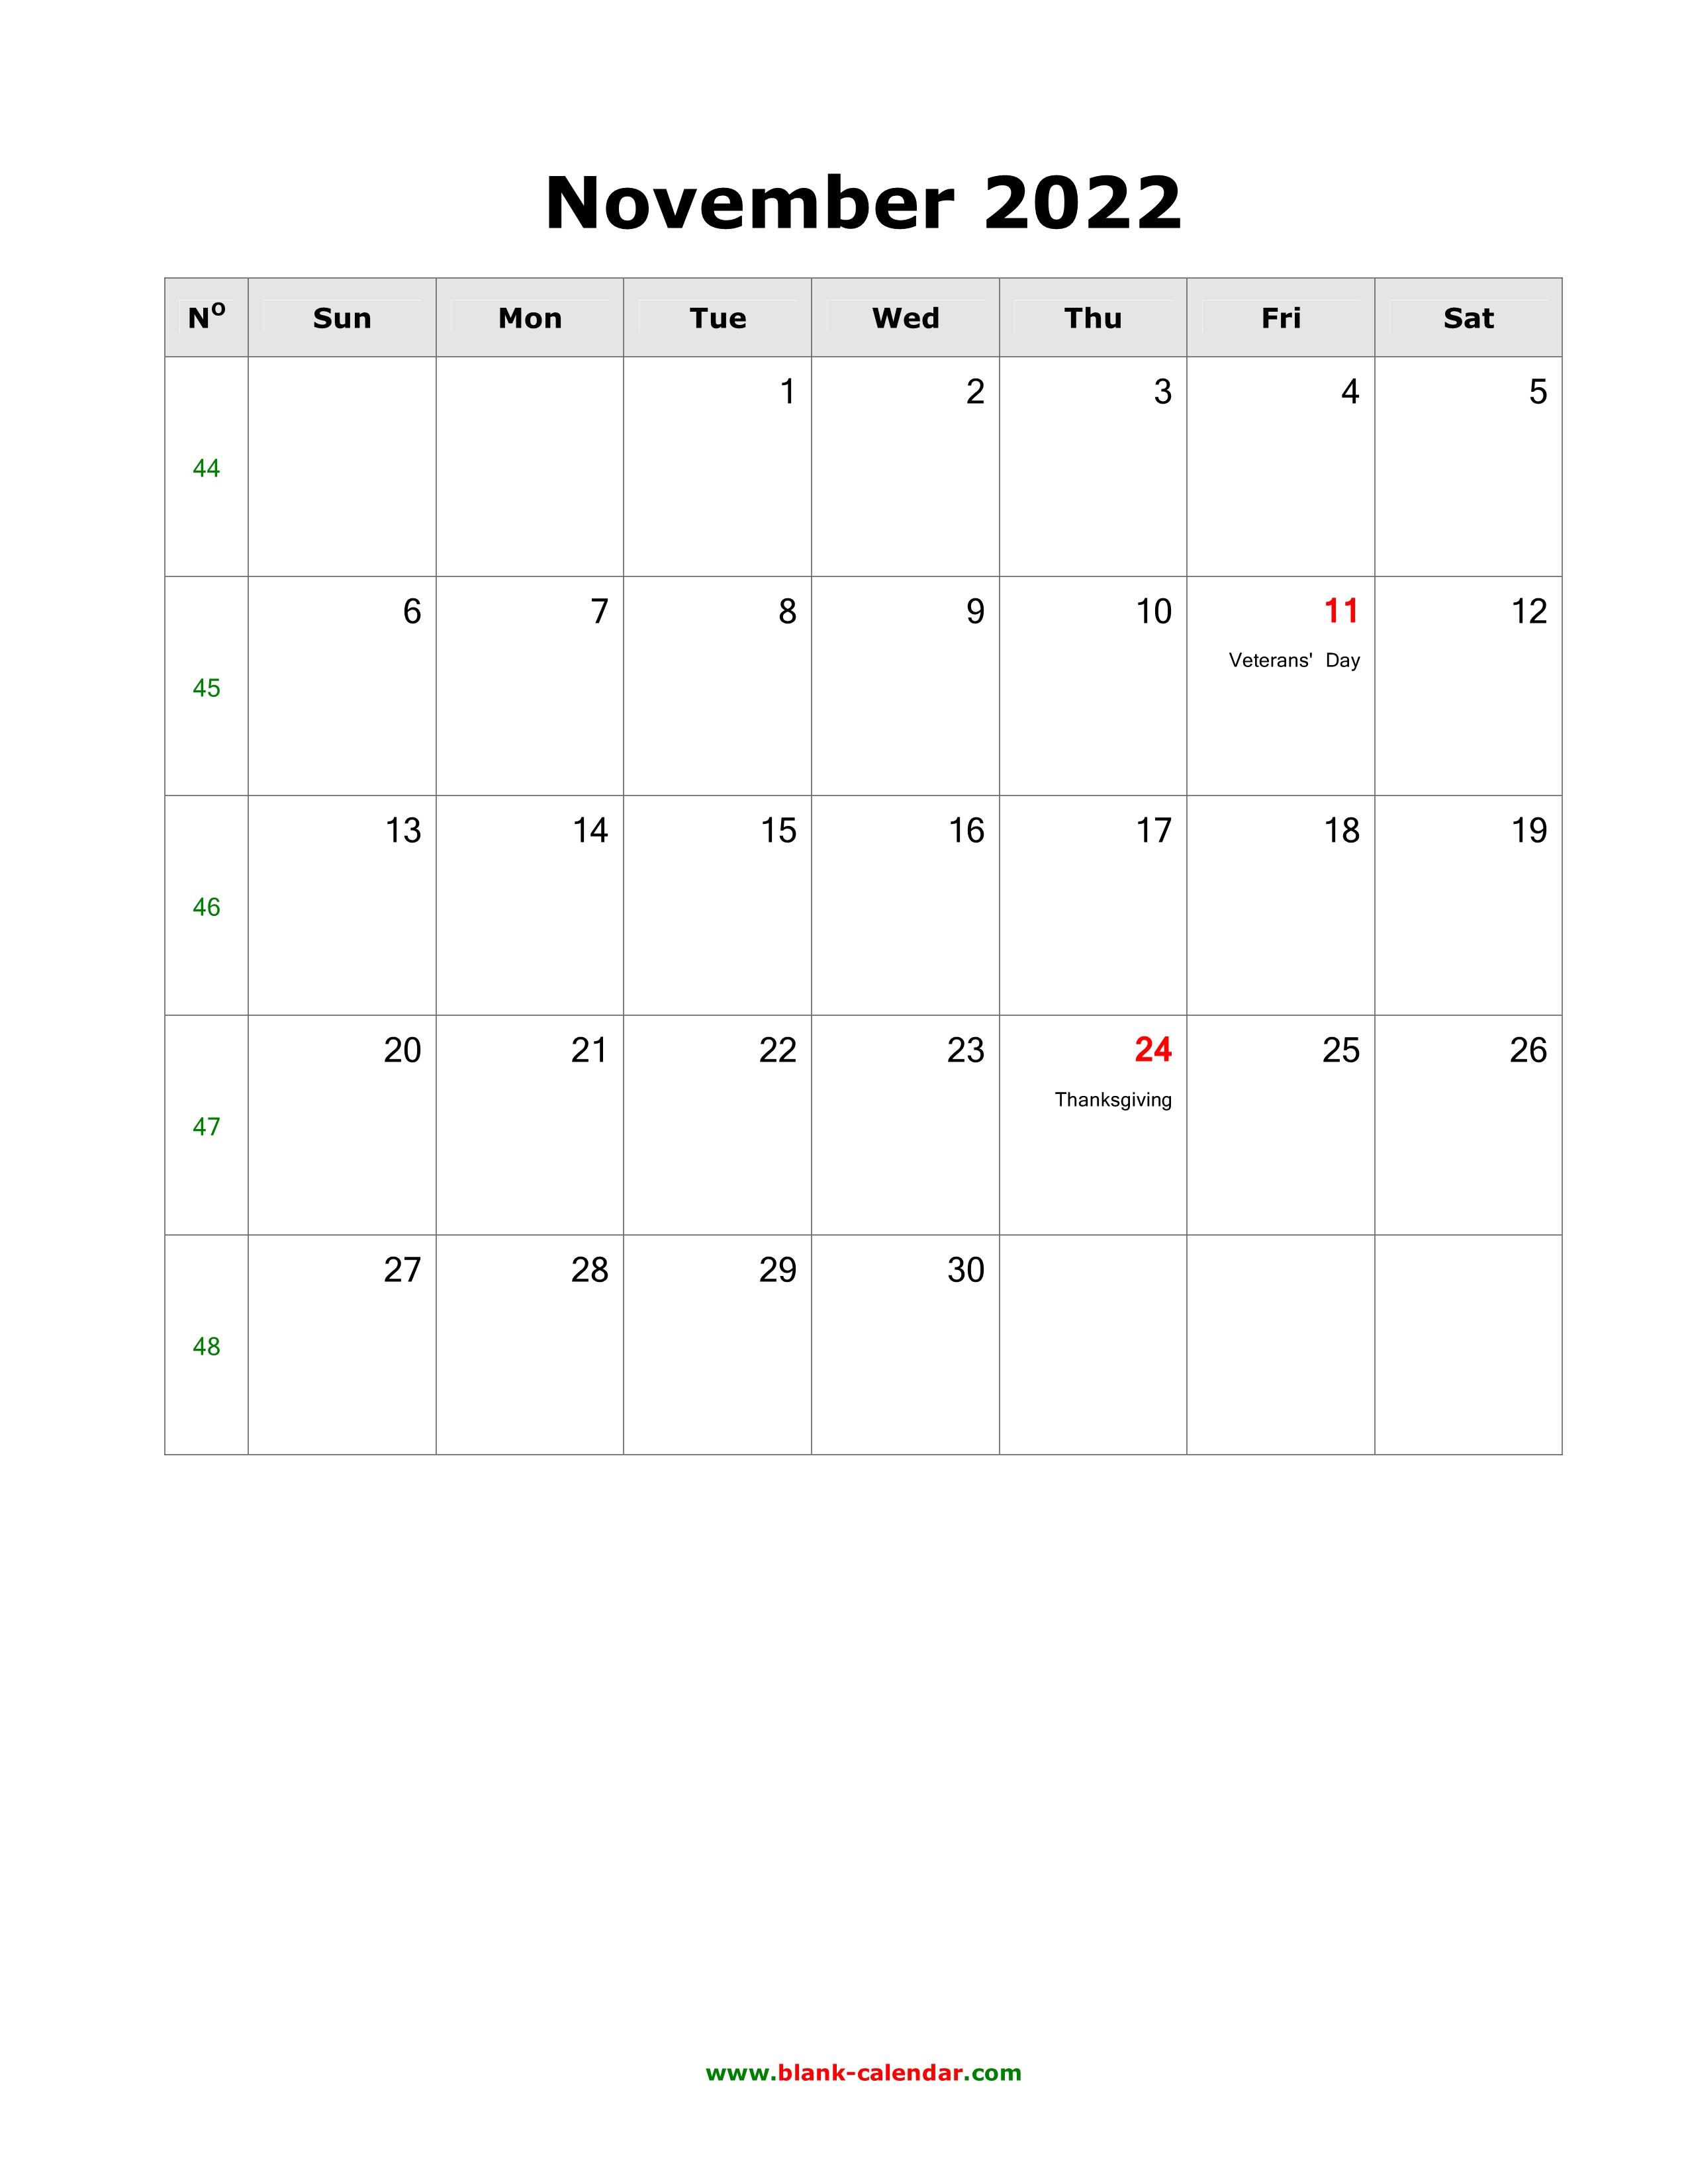 November 2022 Blank Calendar.Download November 2022 Blank Calendar With Us Holidays Vertical